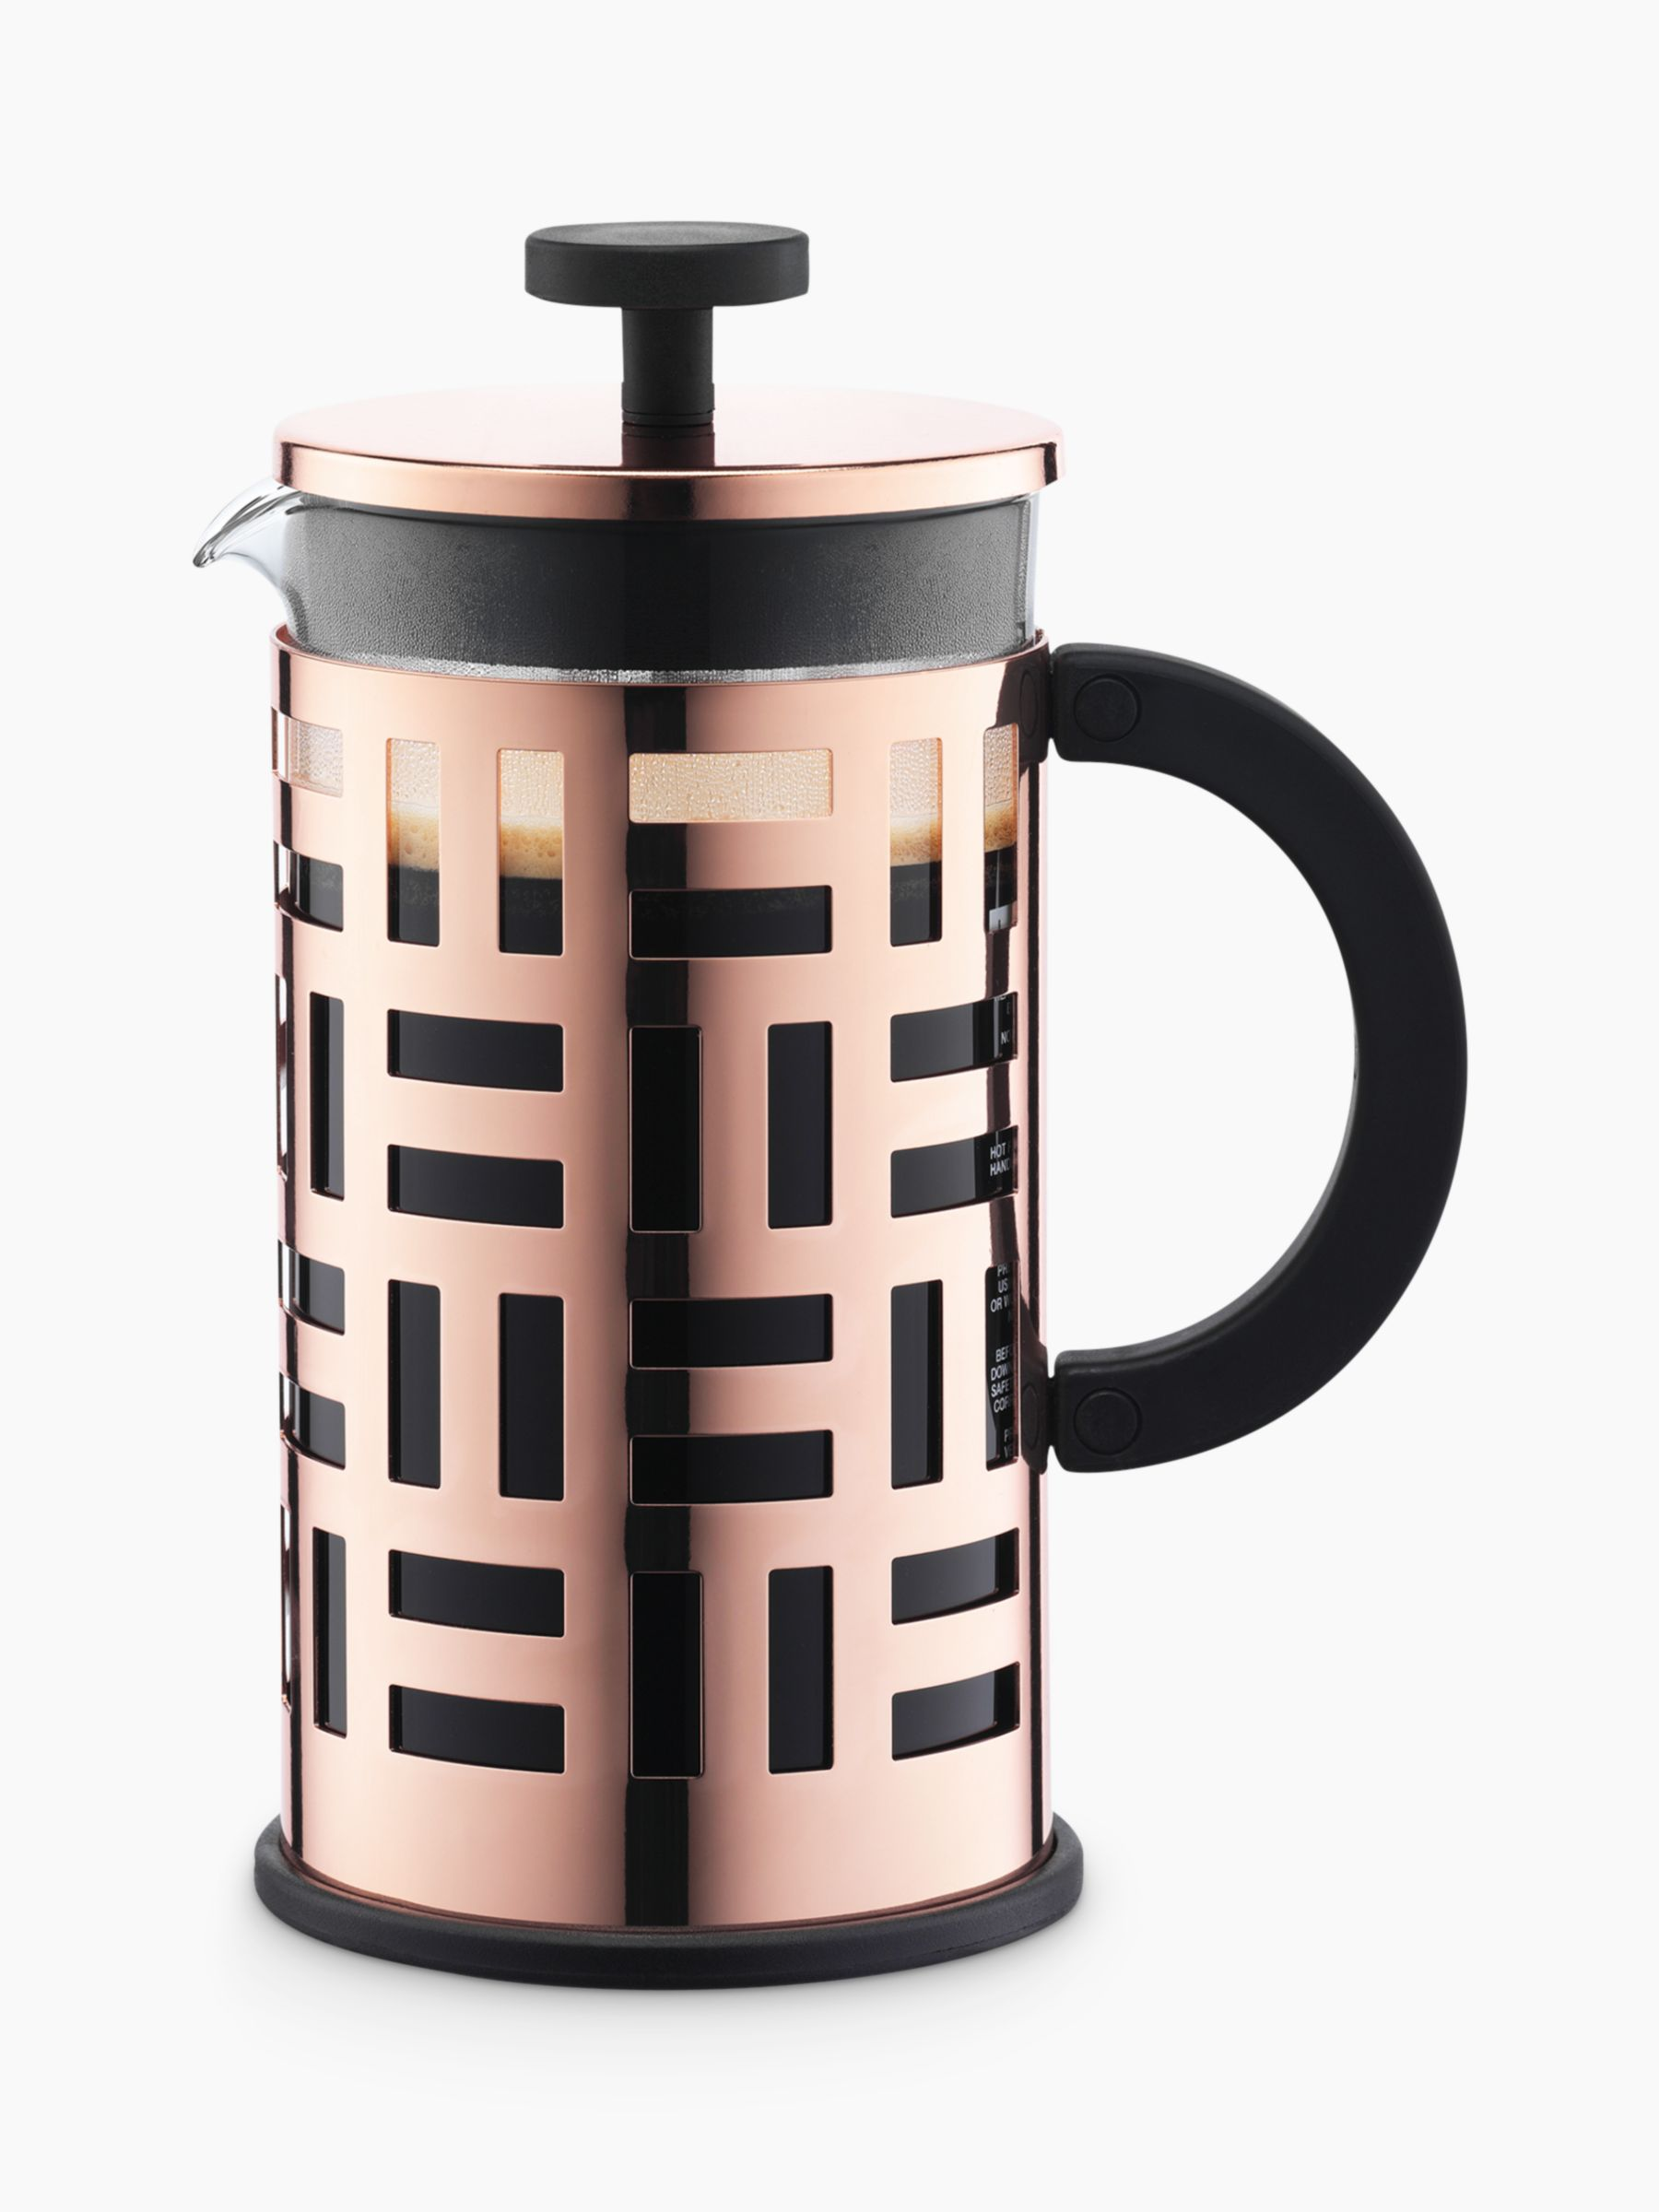 Bodum Bodum Eileen Coffee Maker, 8 Cup, 1L